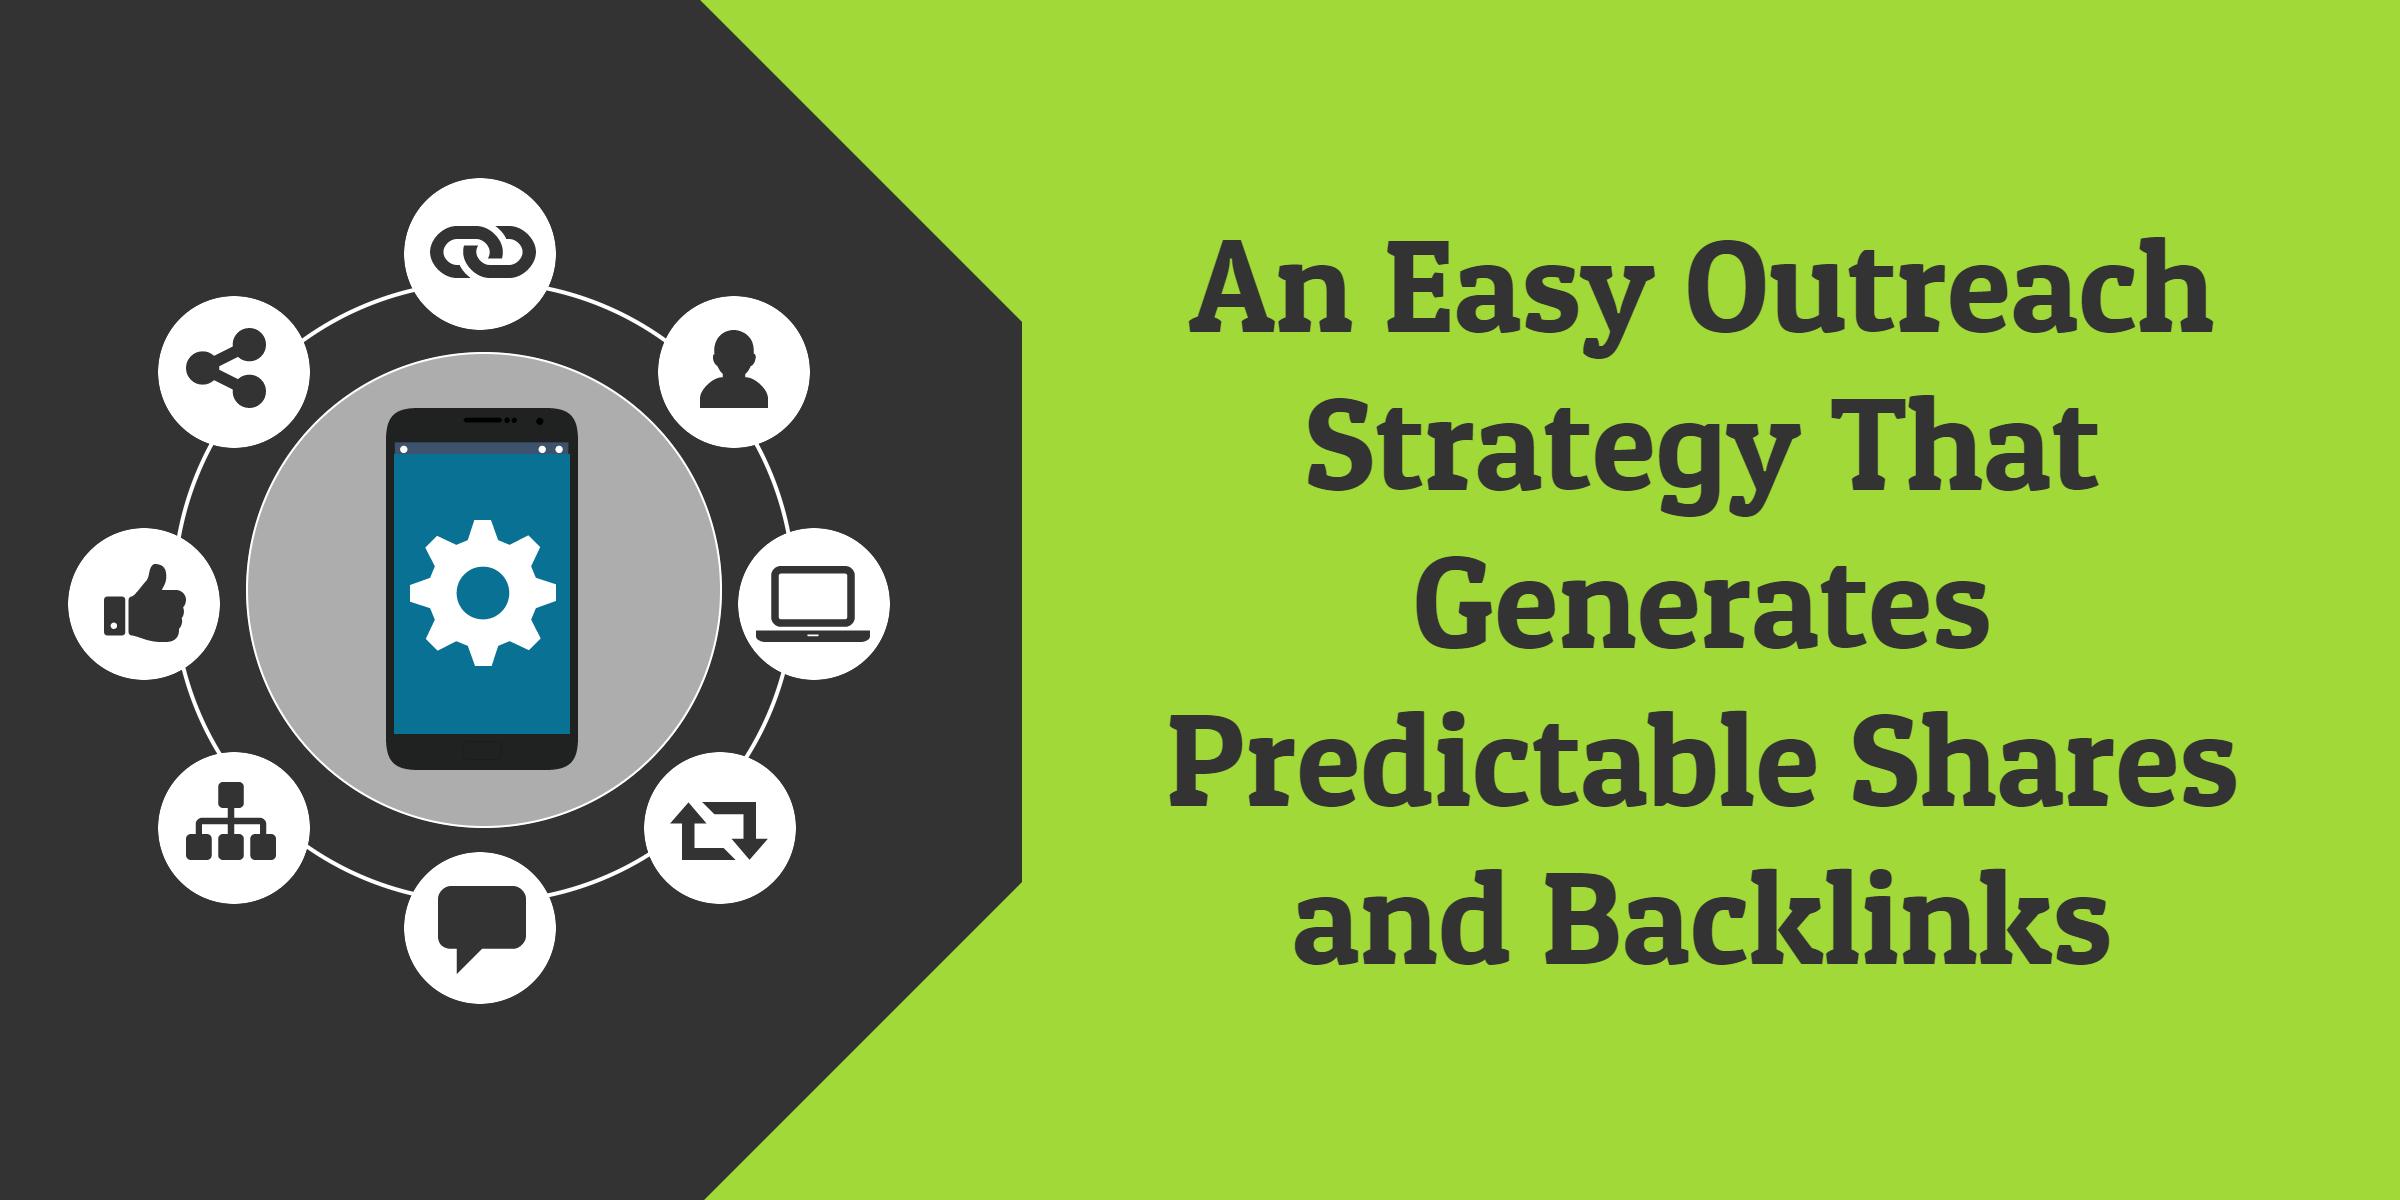 strategic backlinks